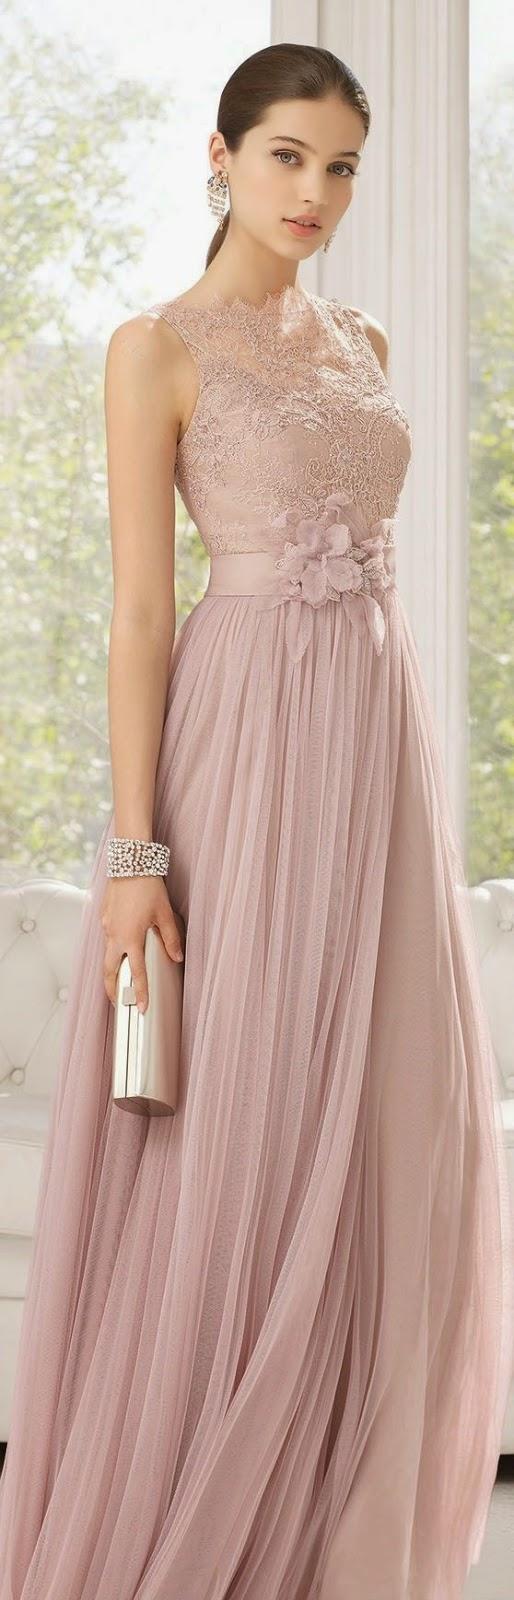 Style know hows wedding dress dress pinterest wedding dress